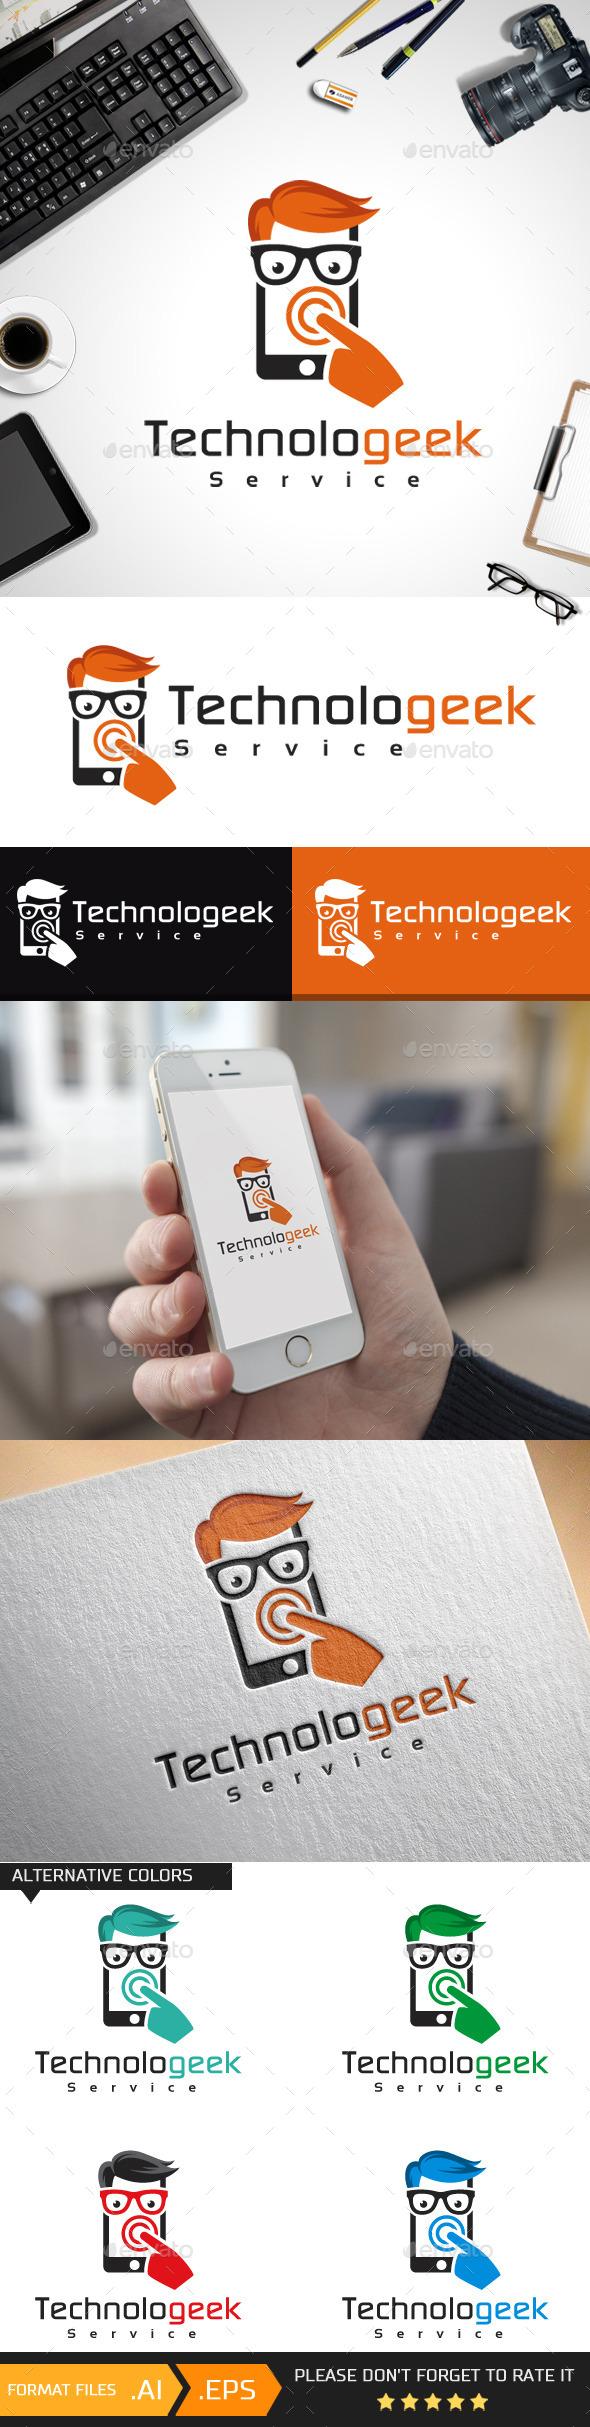 Technologeek Logo Template - Objects Logo Templates